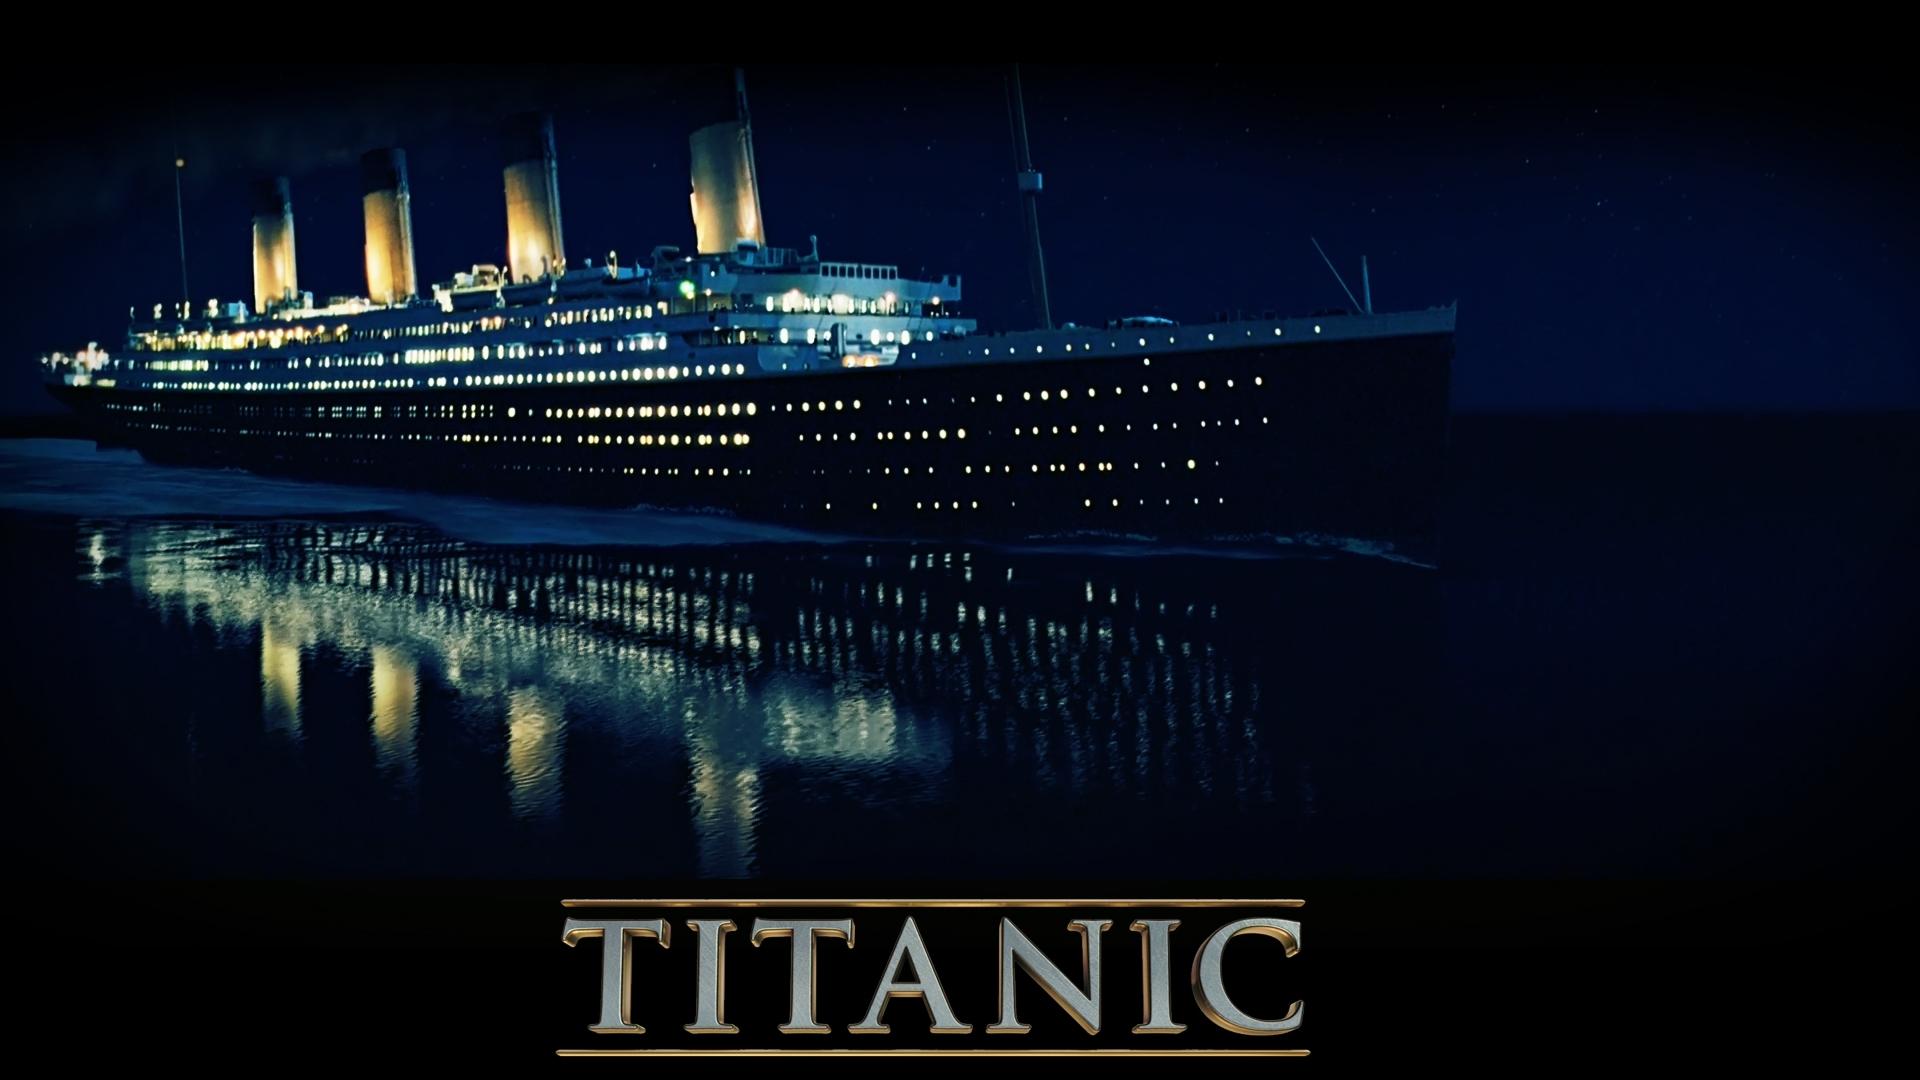 Titanic Ship wallpaper